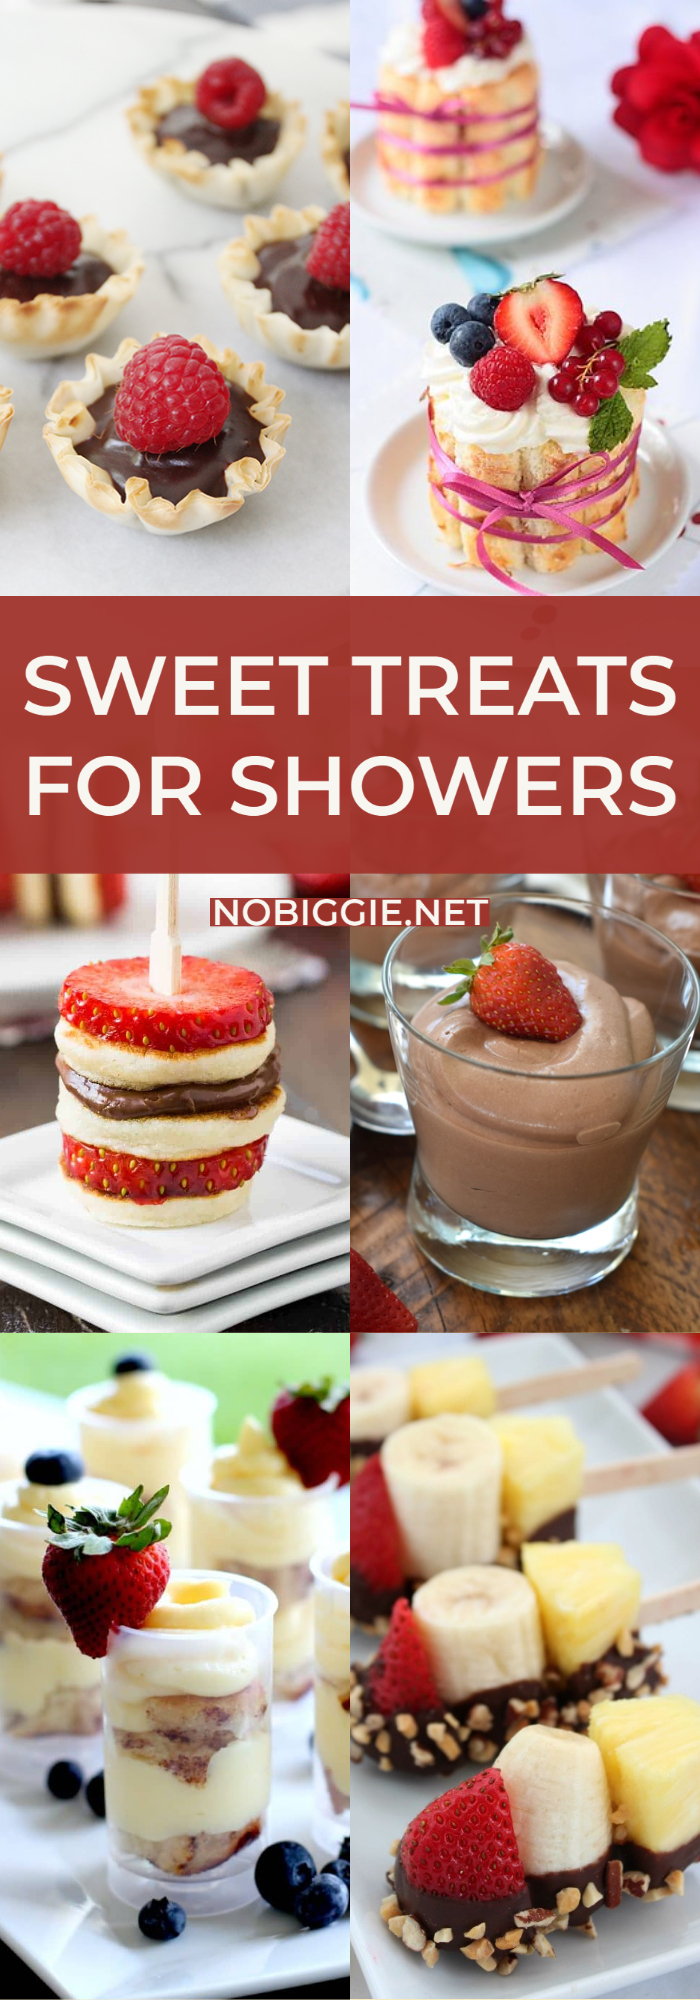 Sweet Treats for Showers | NoBiggie.net